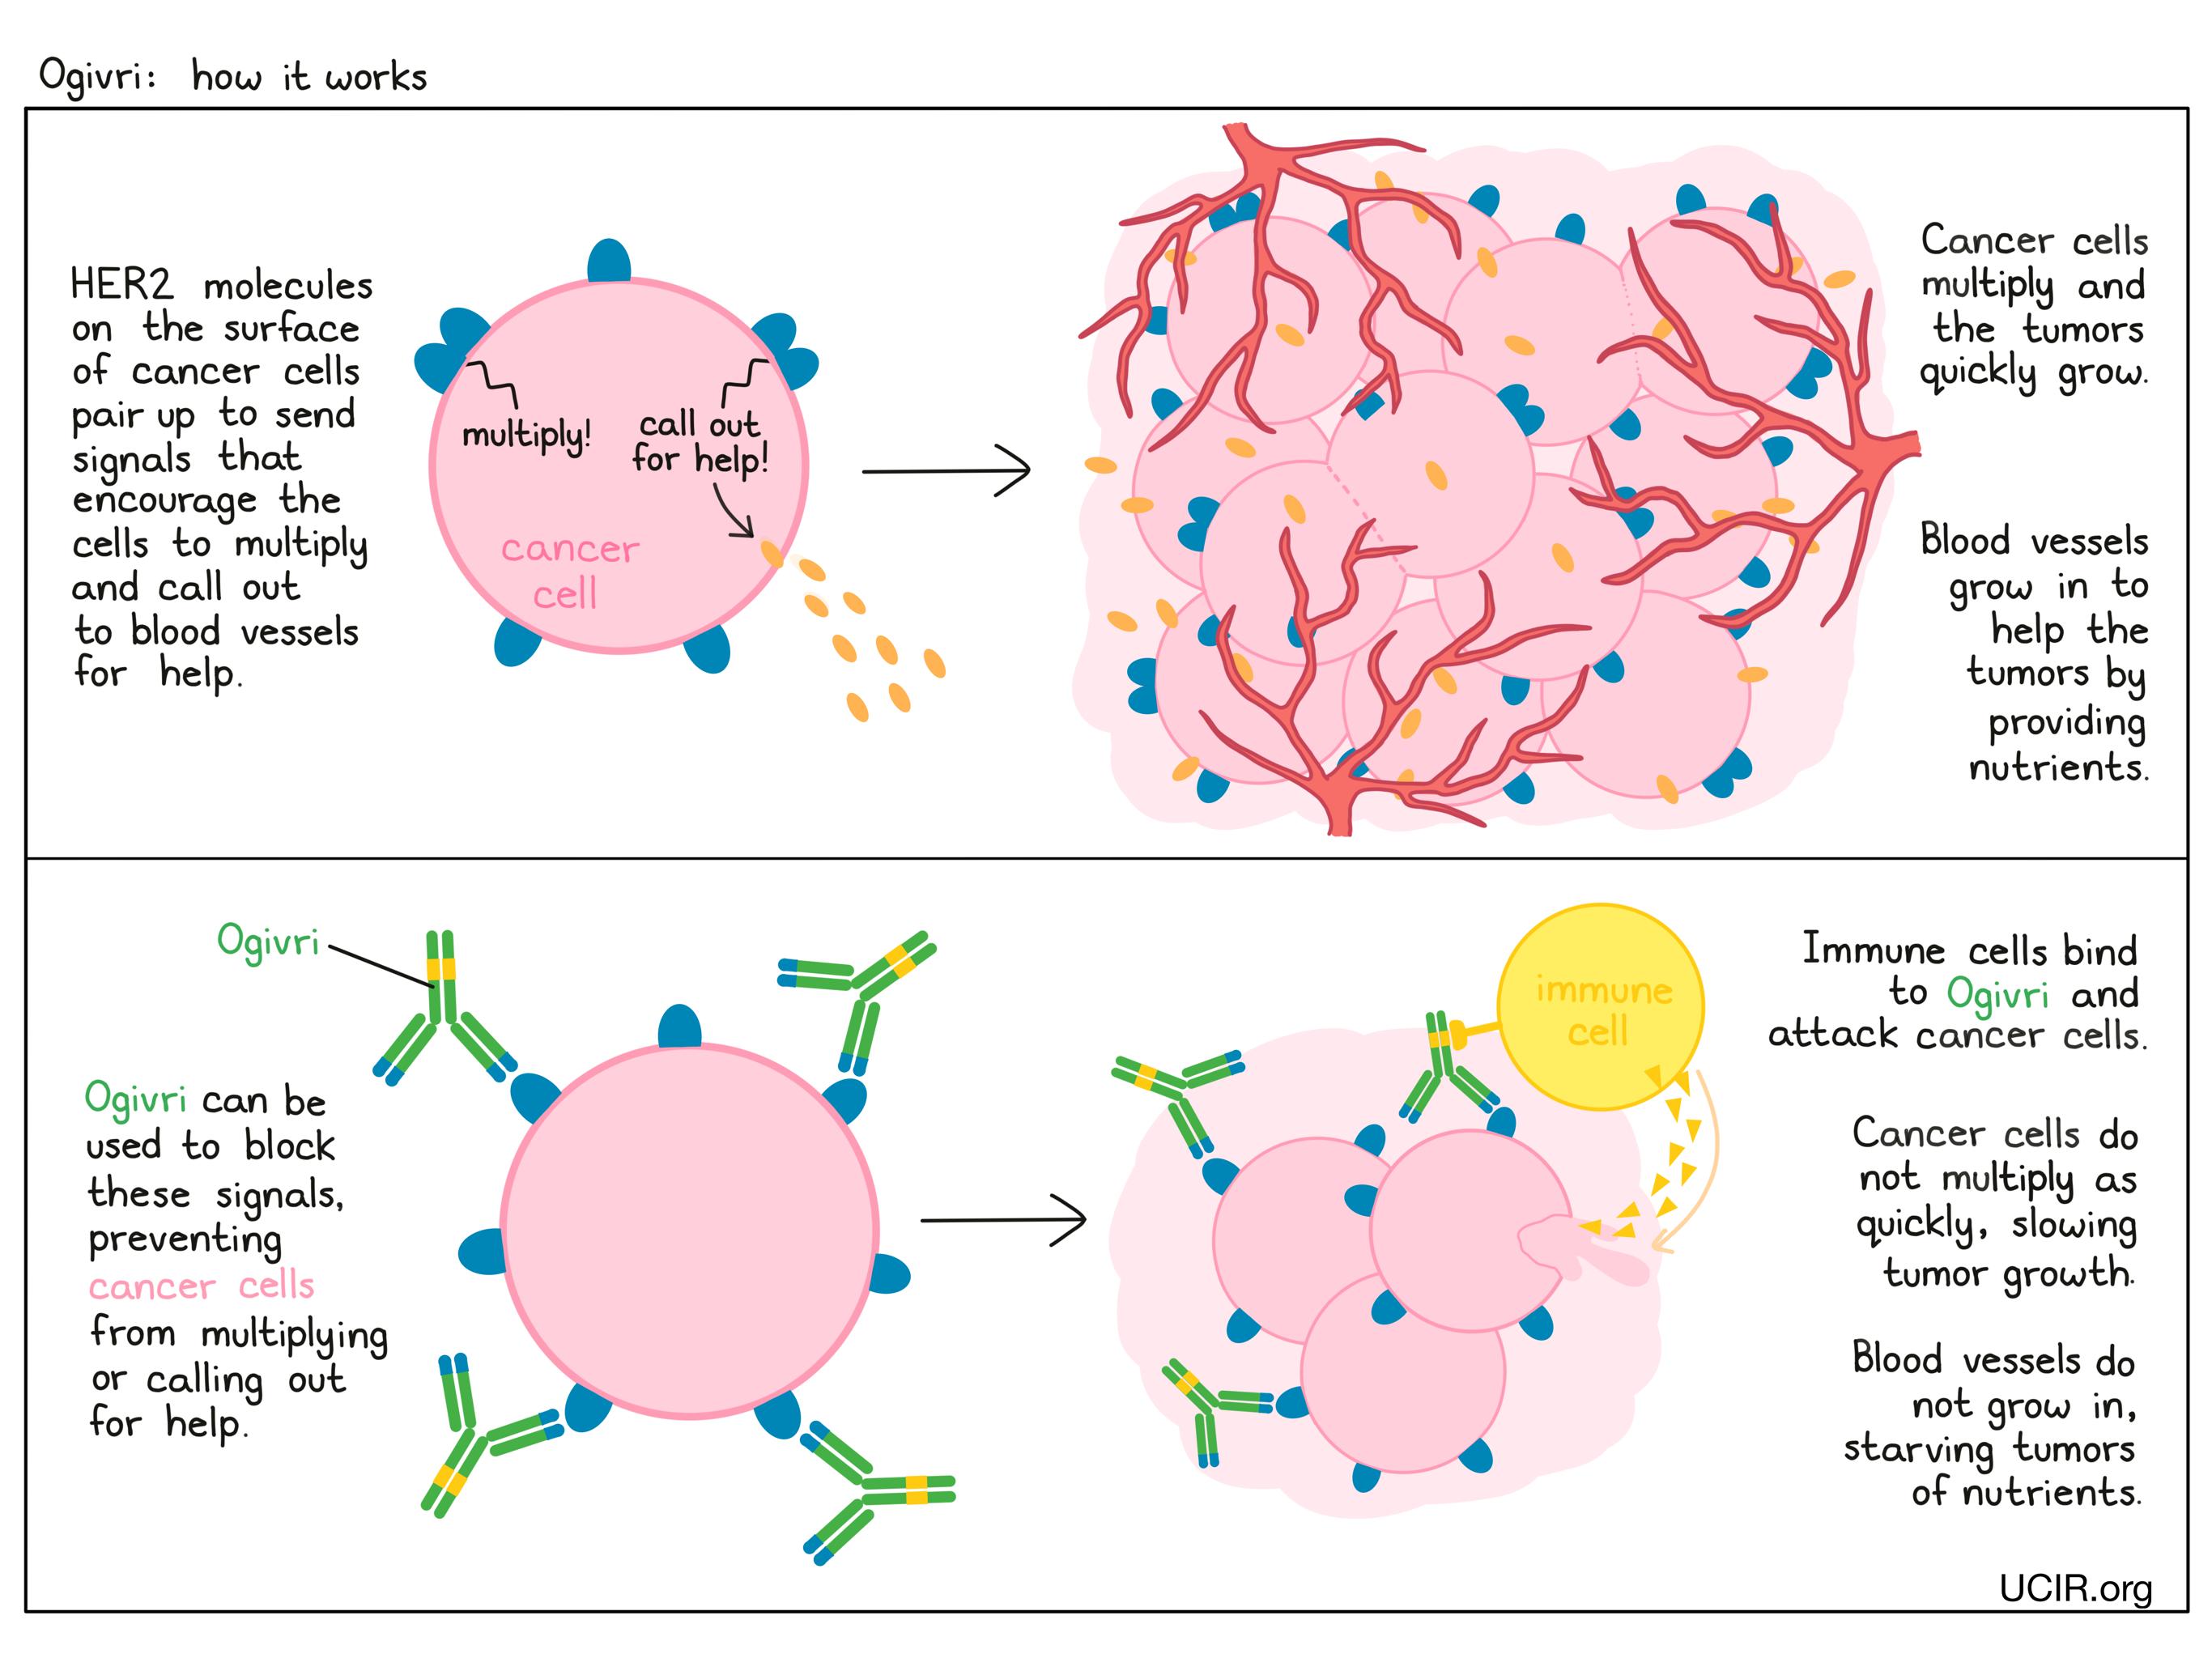 Illustration showing how Ogivri works